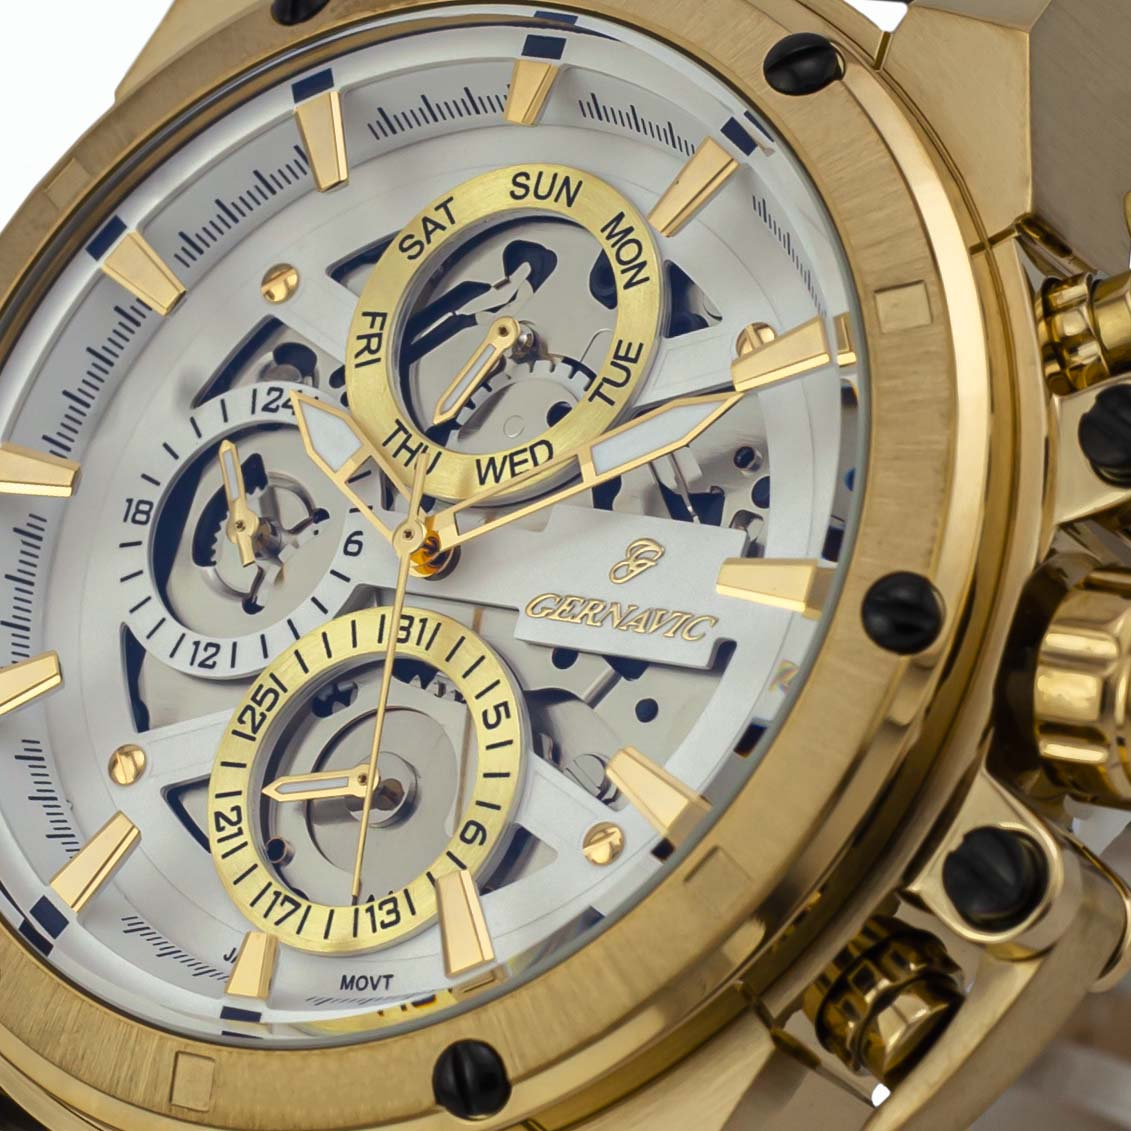 ساعت مچی عقربهای مردانه گرناویچ مدل 450MBrGW